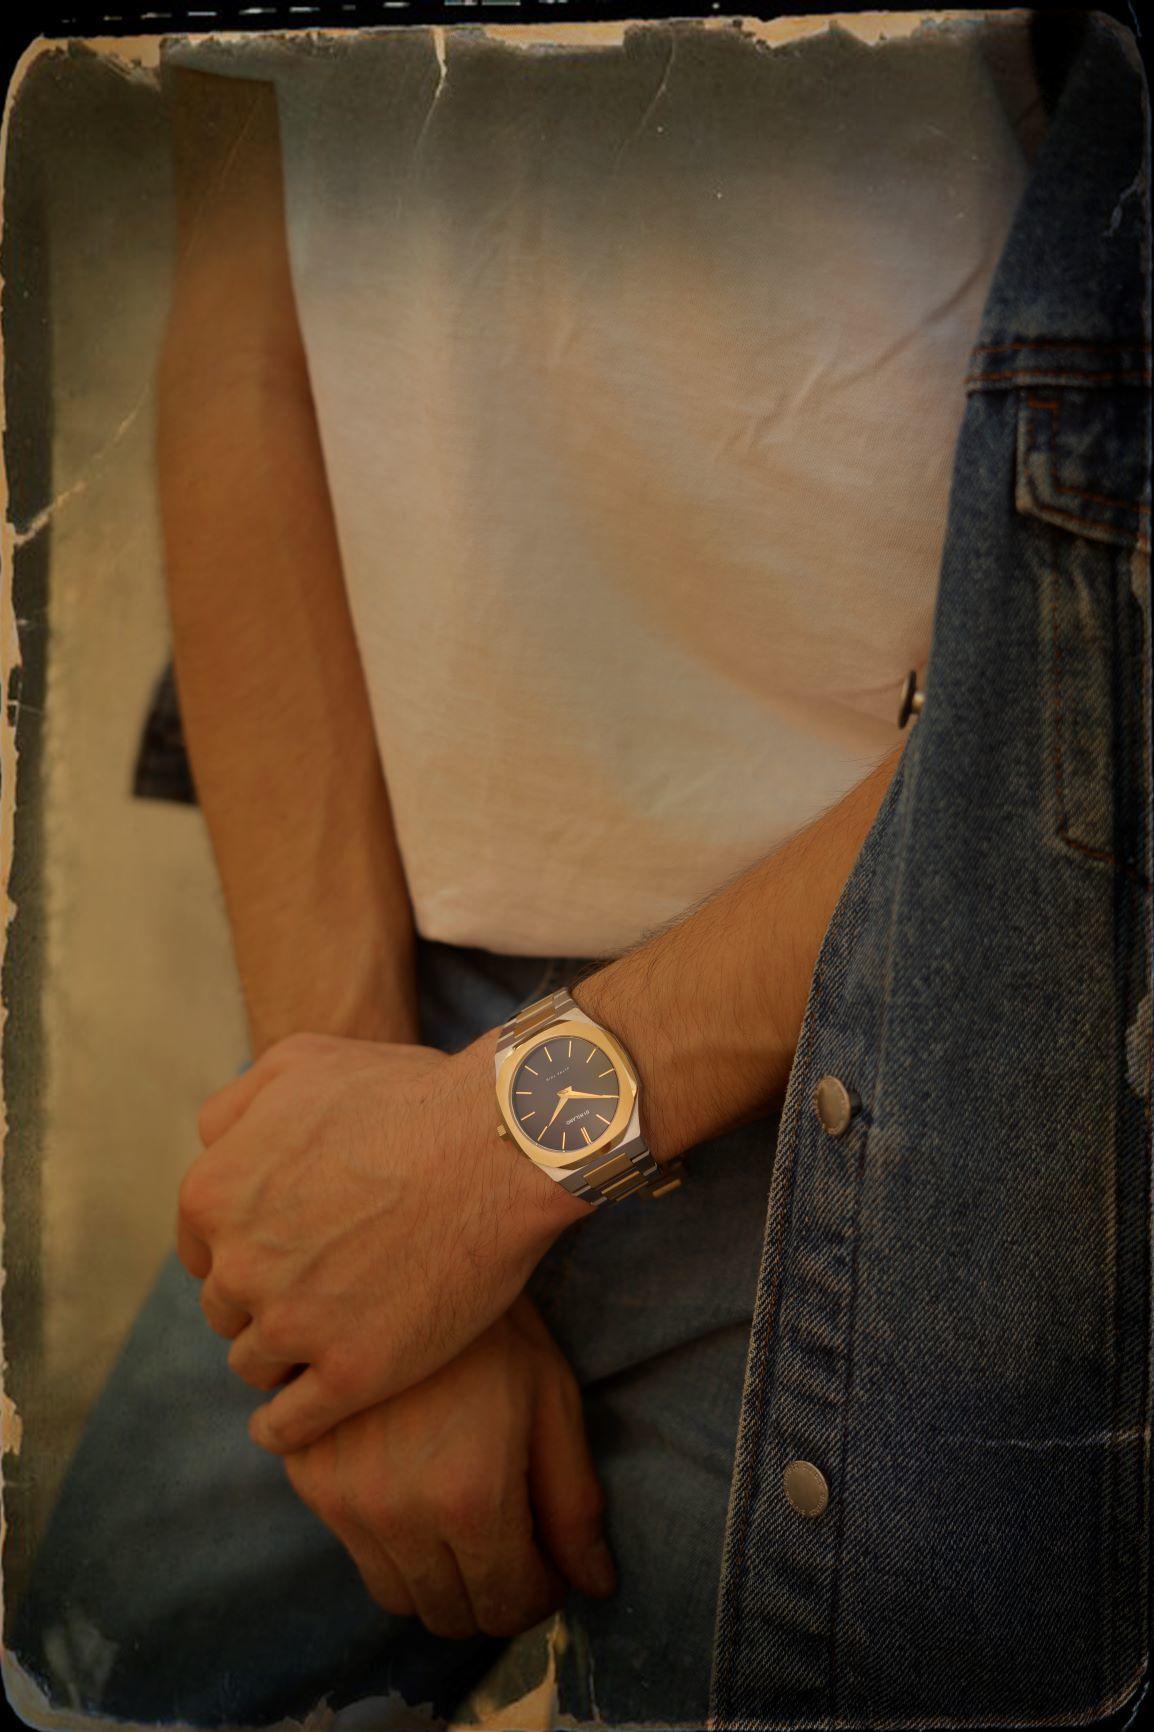 Jam Tangan a la 70an Karya D1 Milano yang Timeless Banget!